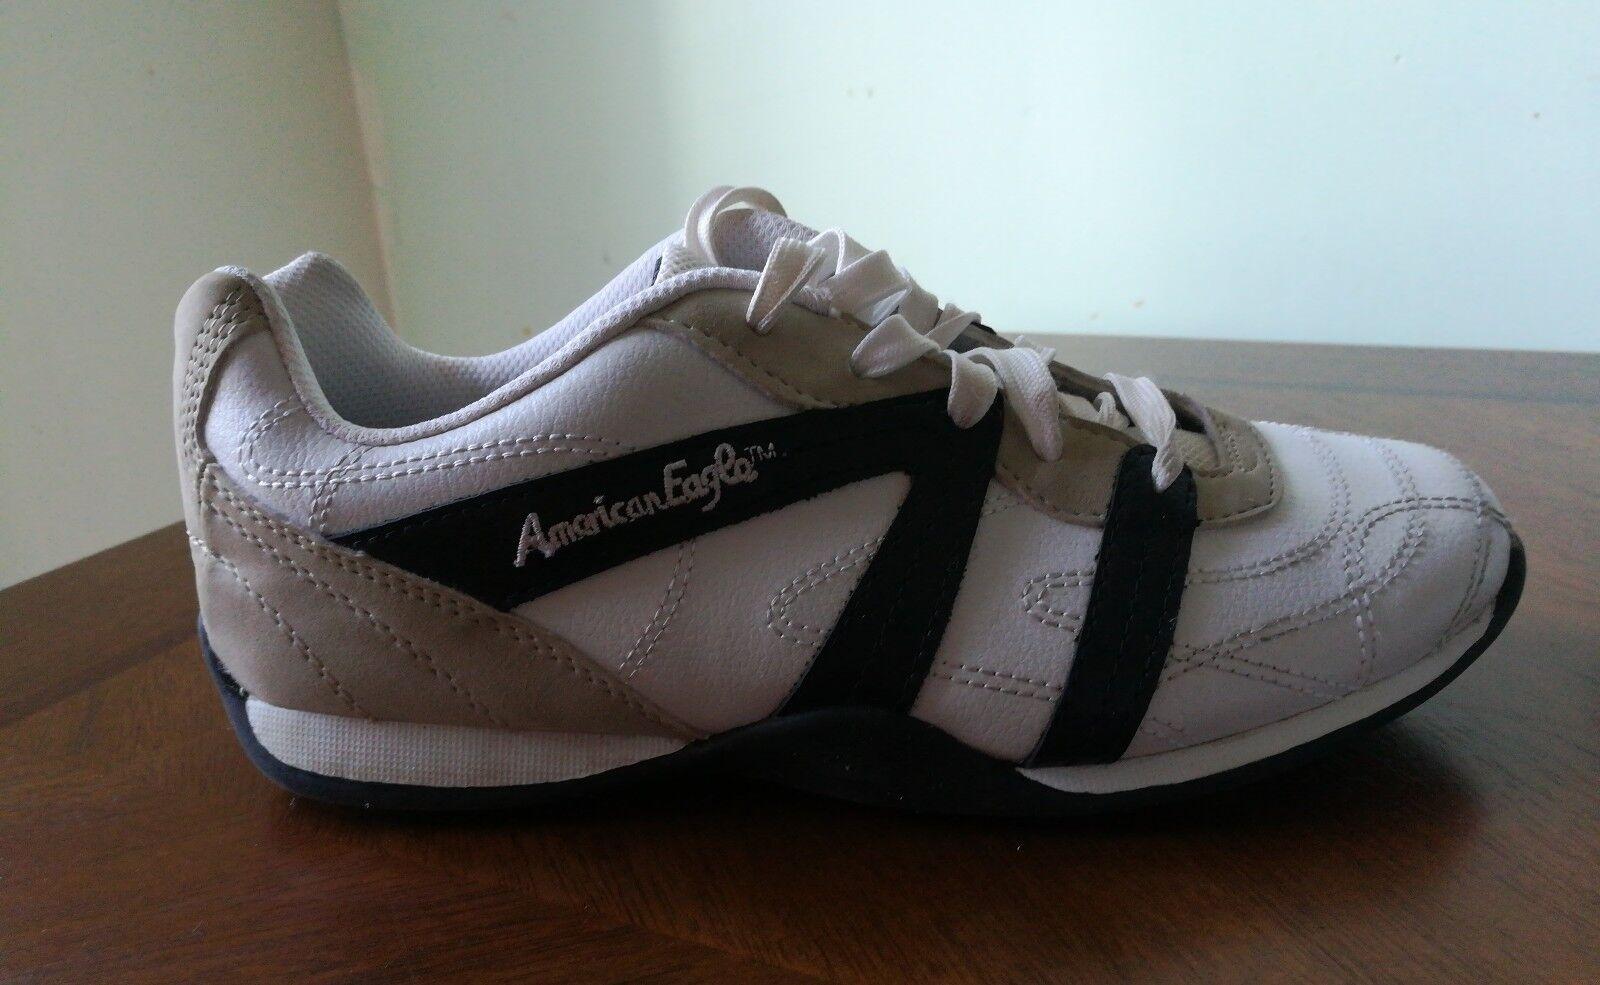 American Eagle Mens Athletic Shoes color 6 white tan black Size 6 color c904a0